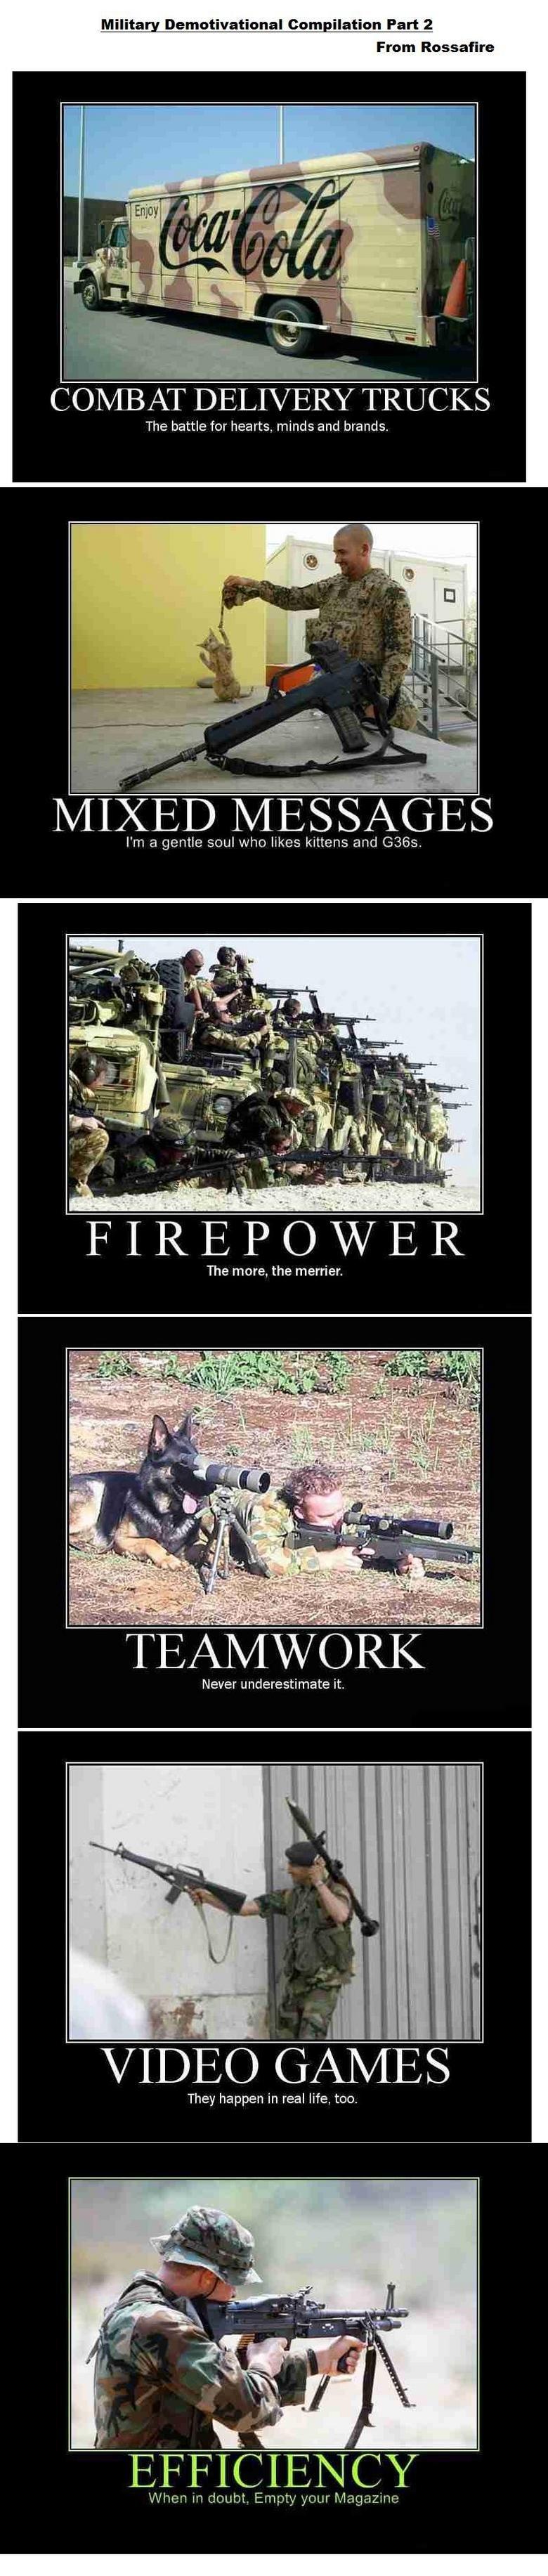 Military Demotivational Compilation 2. More military demotivators<br /> Part 1: www.funnyjunk.com/funny_pictures/714394/Military+Demotivational+Compilatio Military